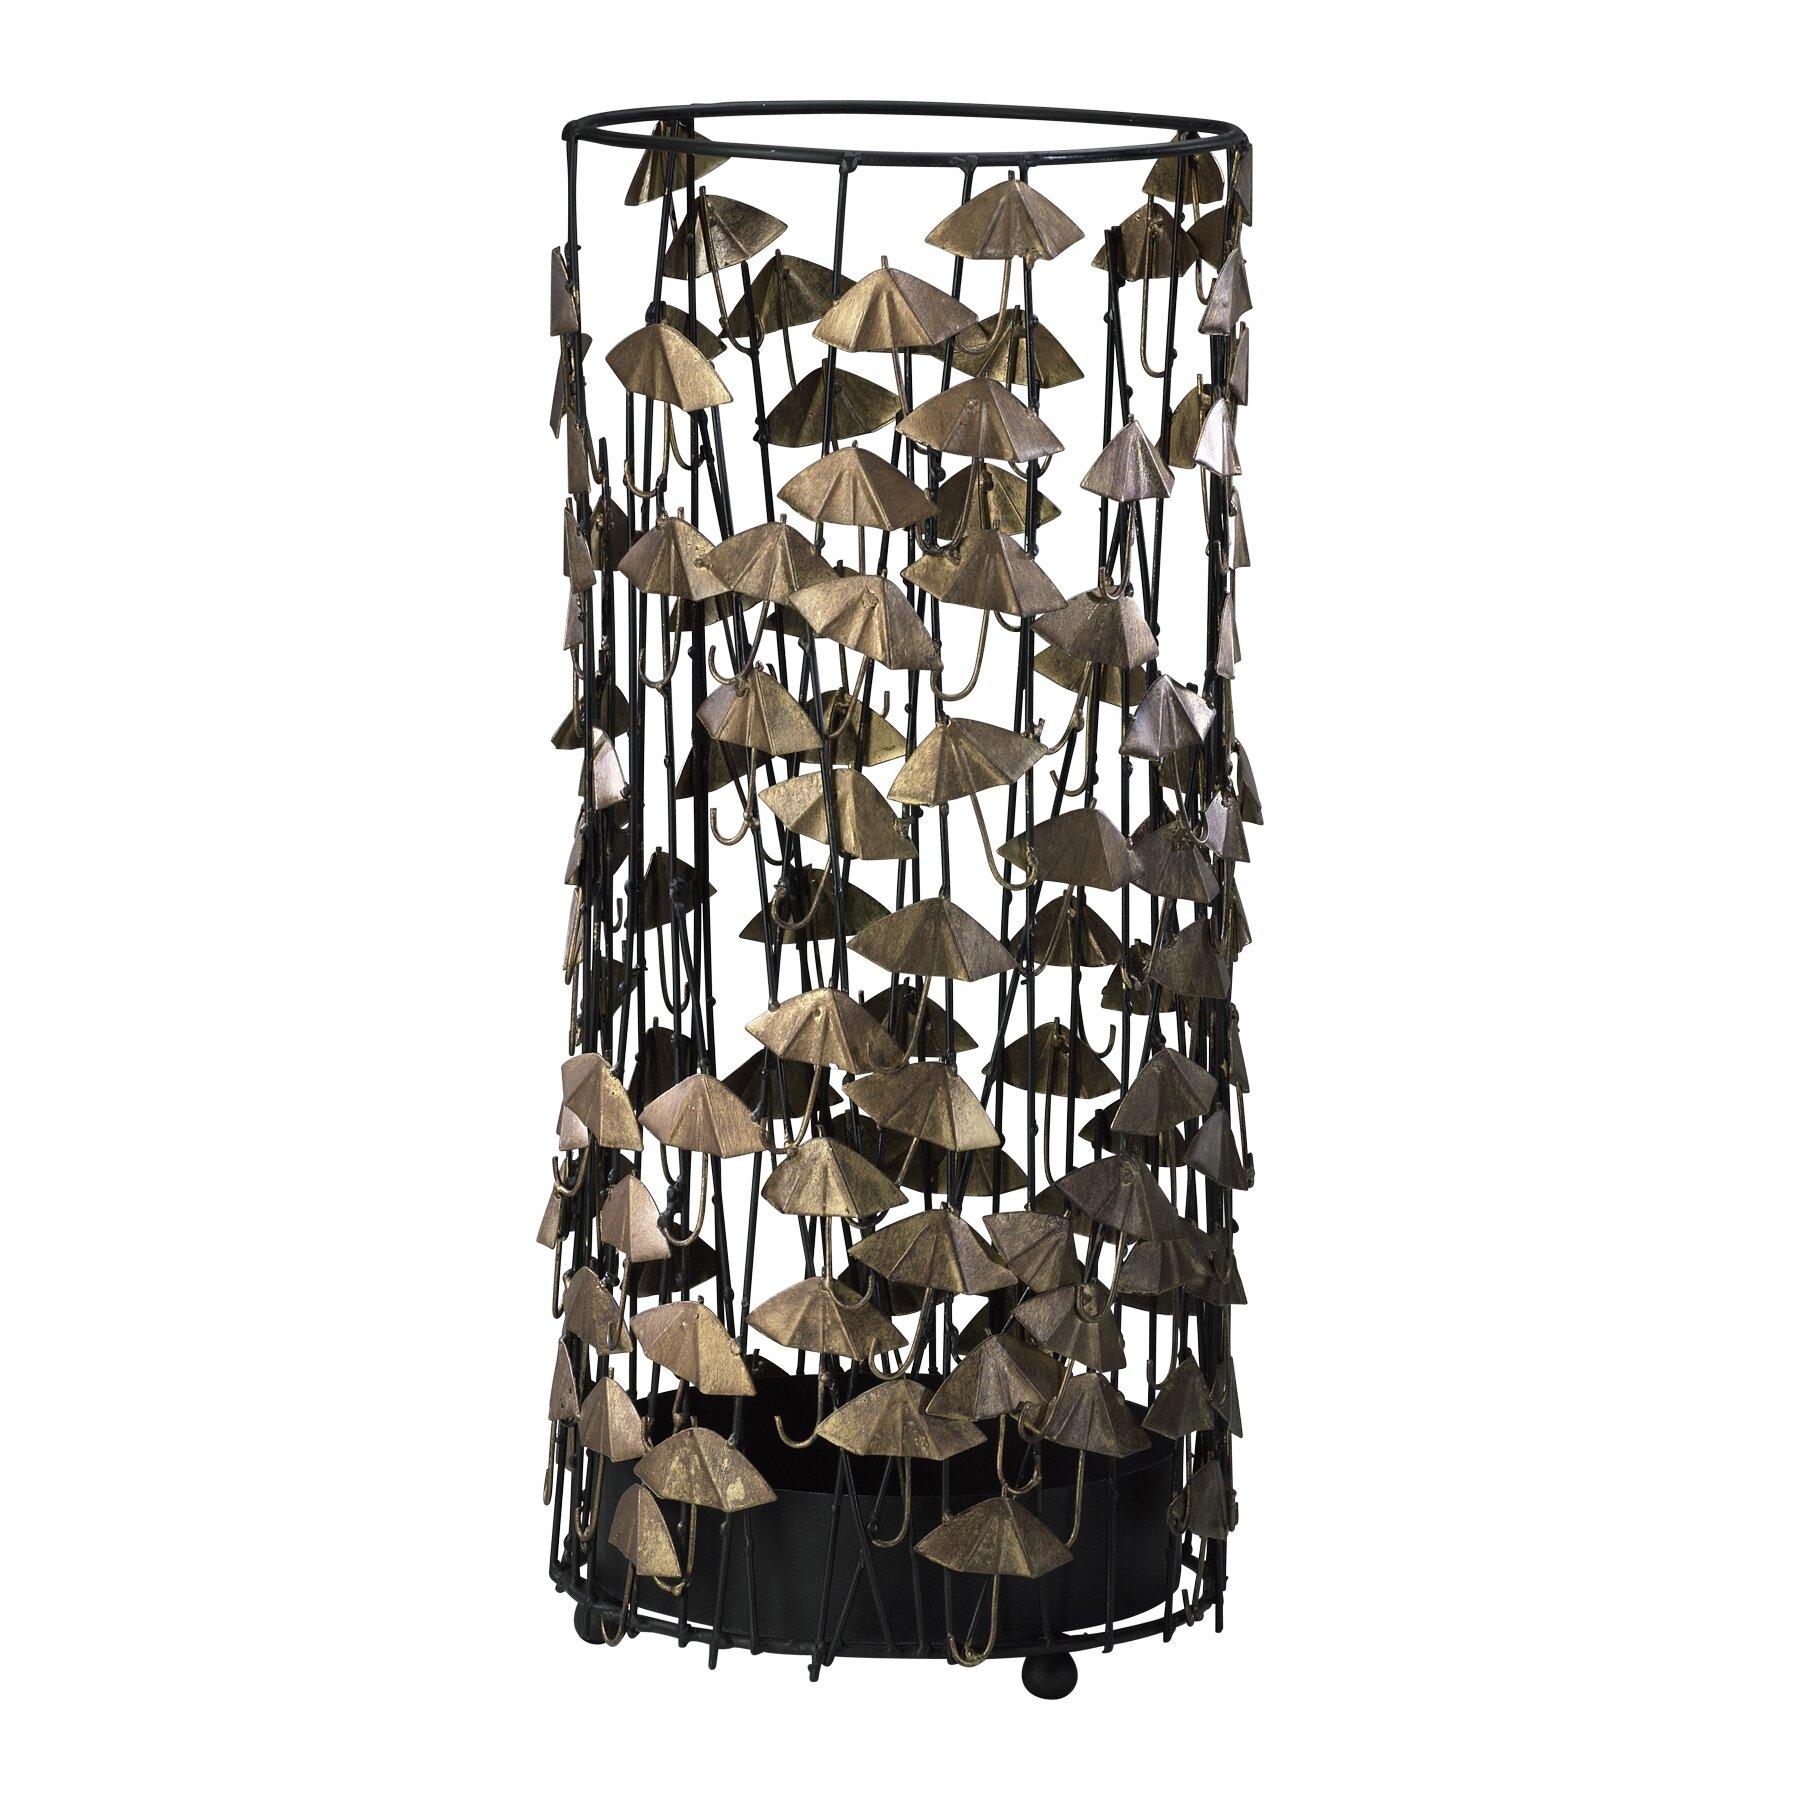 Umbrella Stand Wayfair: Cyan Design Umbrella Stand & Reviews